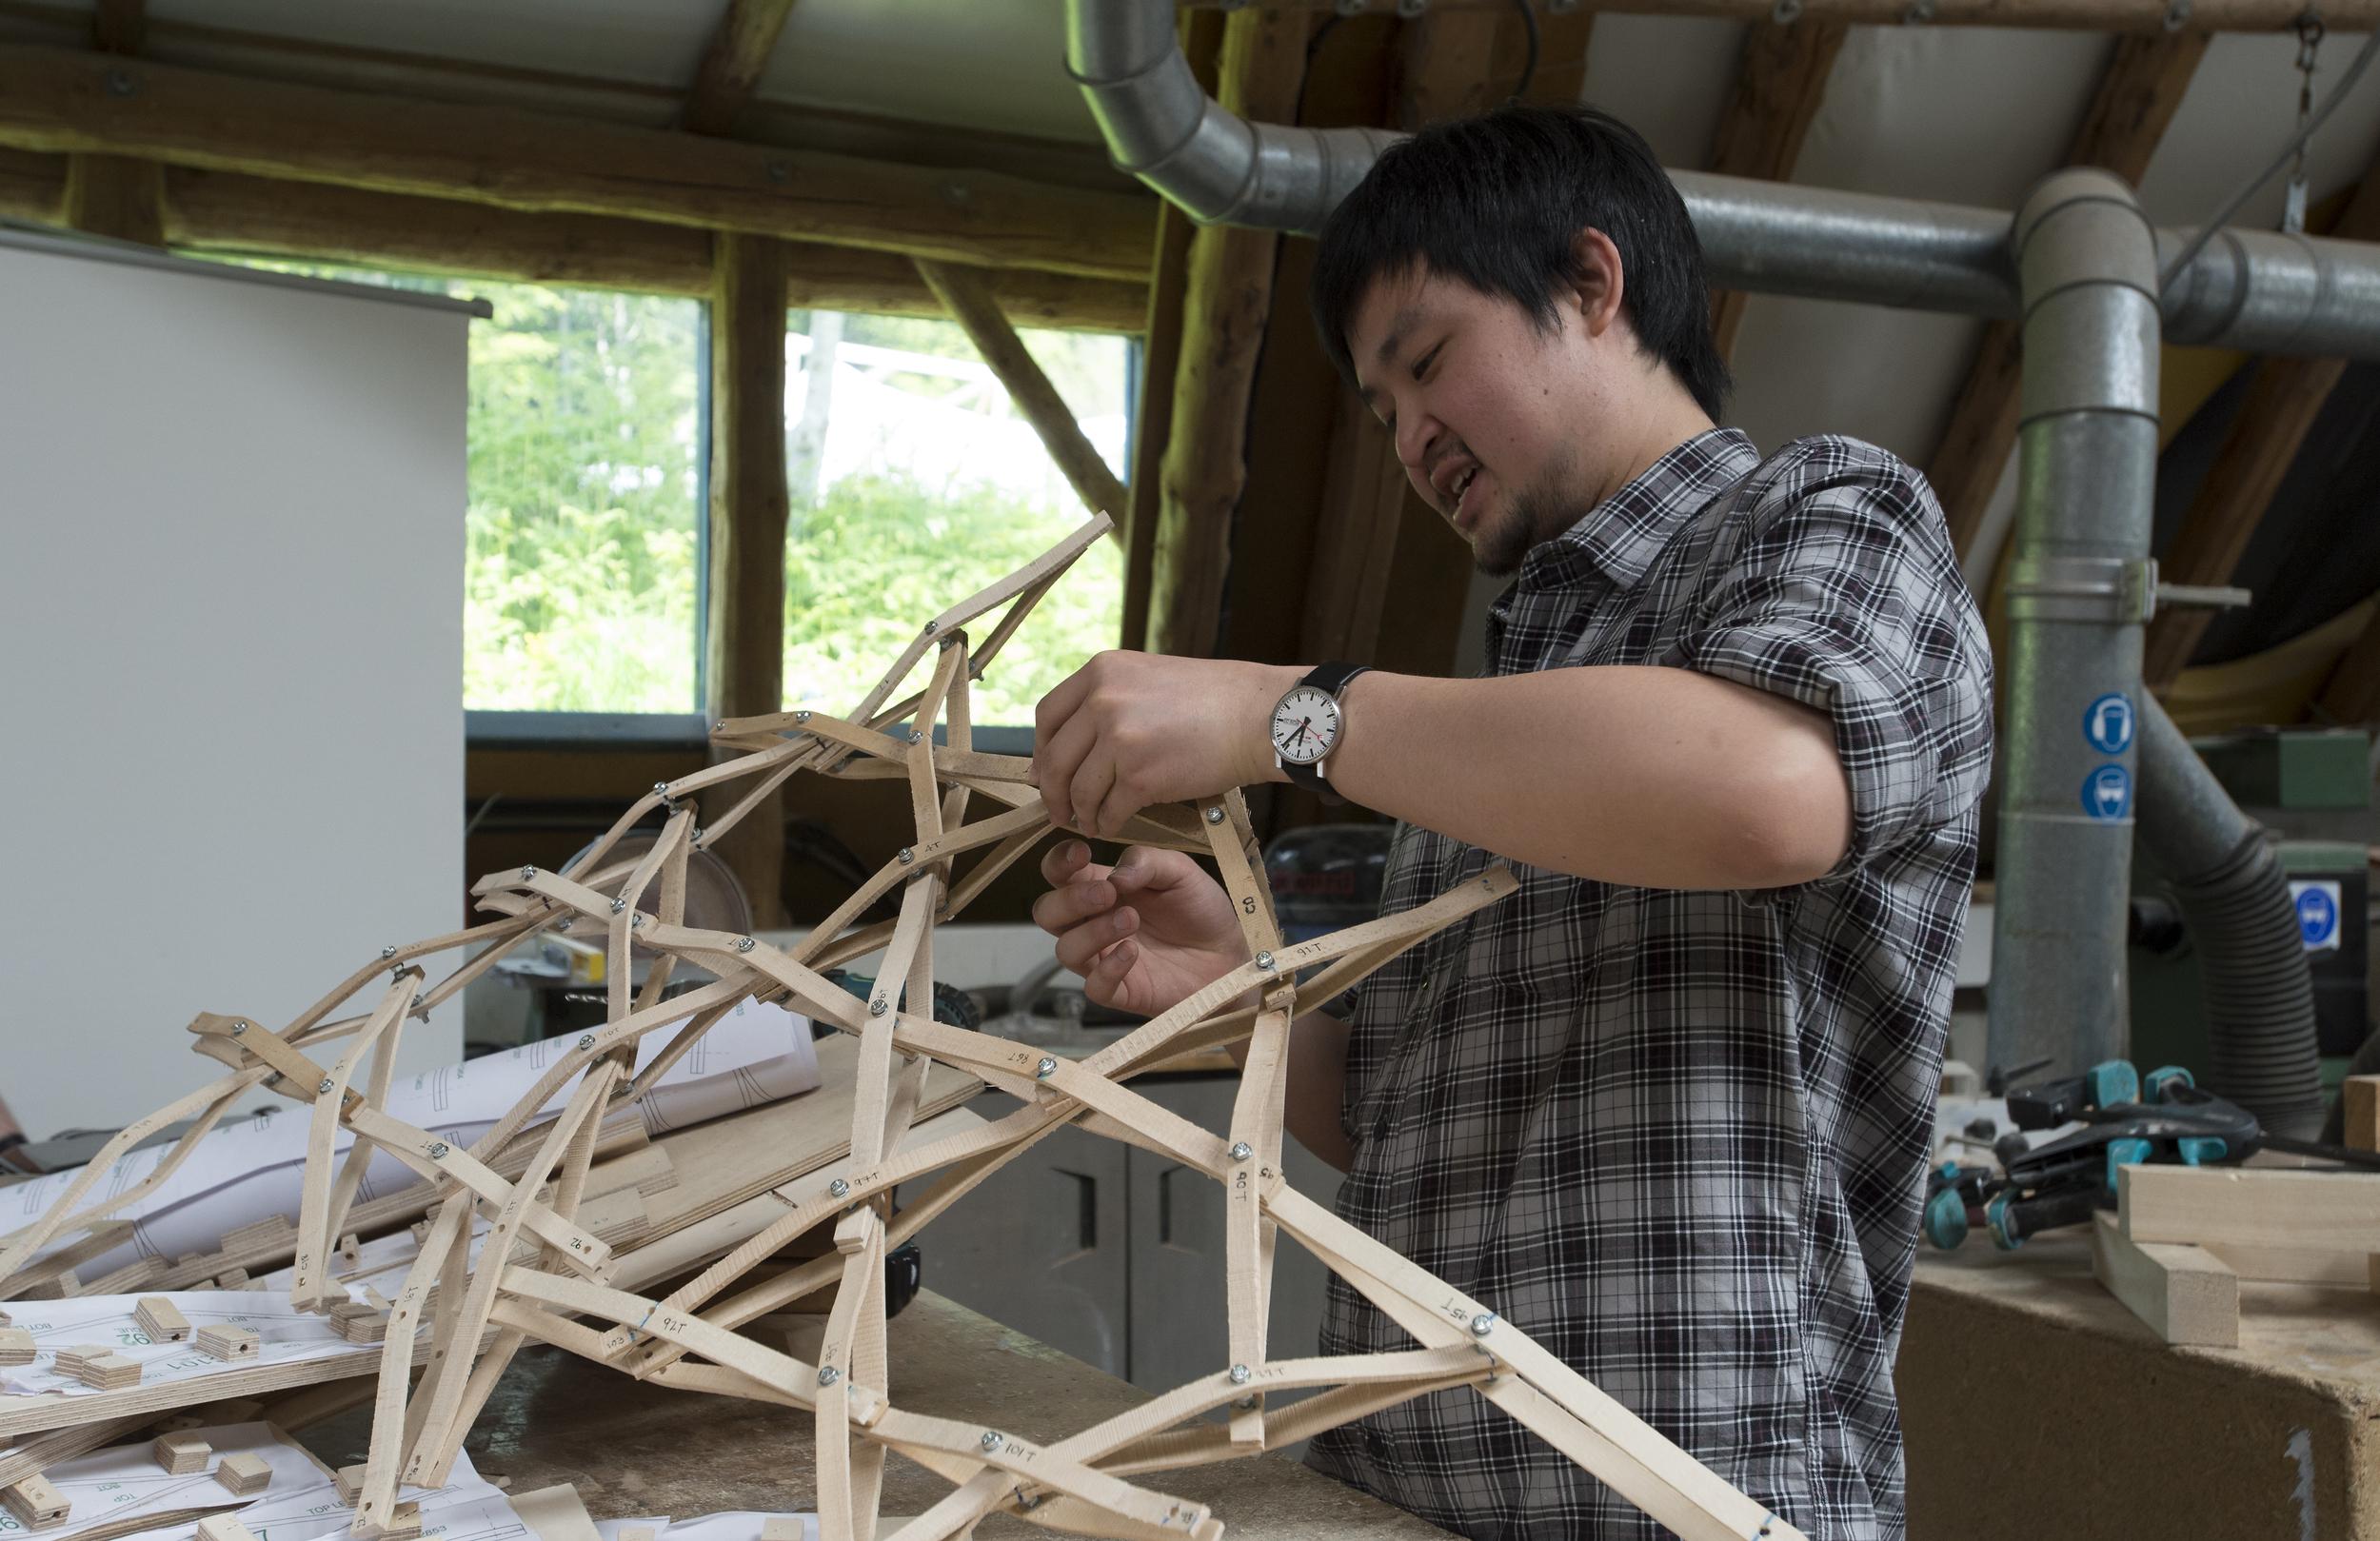 Hooke_Park_Design_&_Make_Timber_Seasoning_Shelter_Group_VB_2013_06_03_0027.jpg